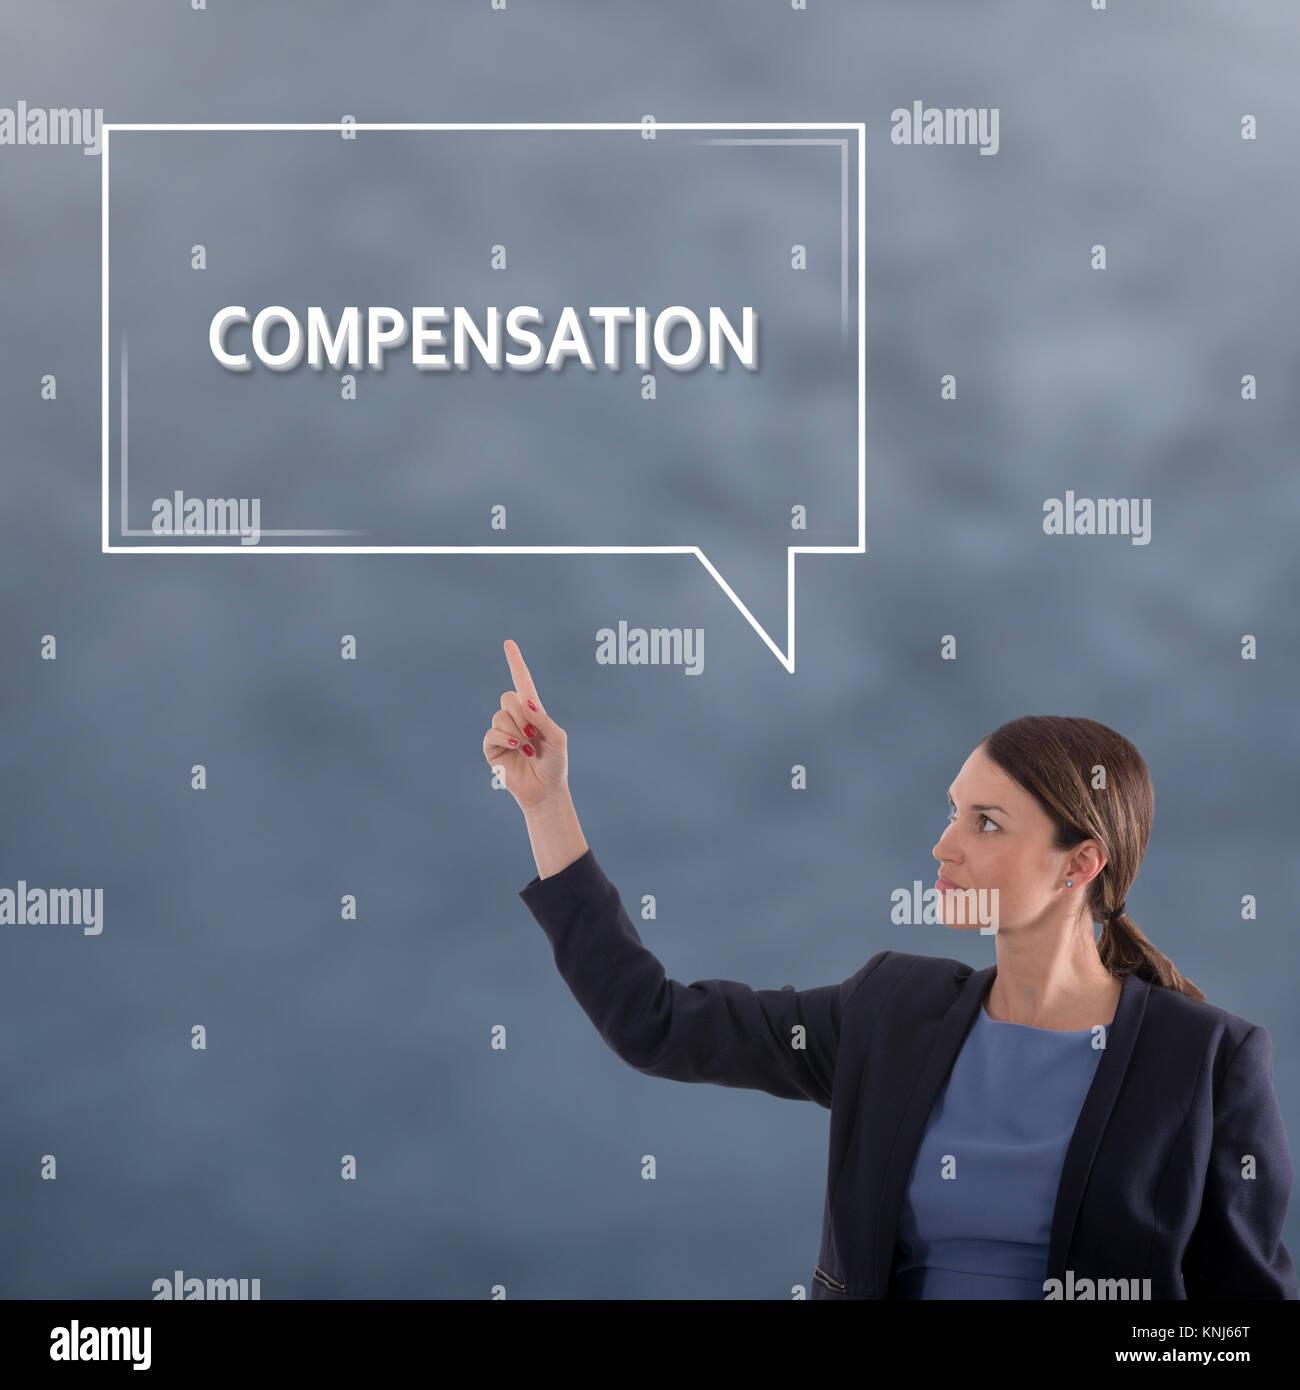 COMPENSATION Business Concept. Business Woman Graphic Concept - Stock Image